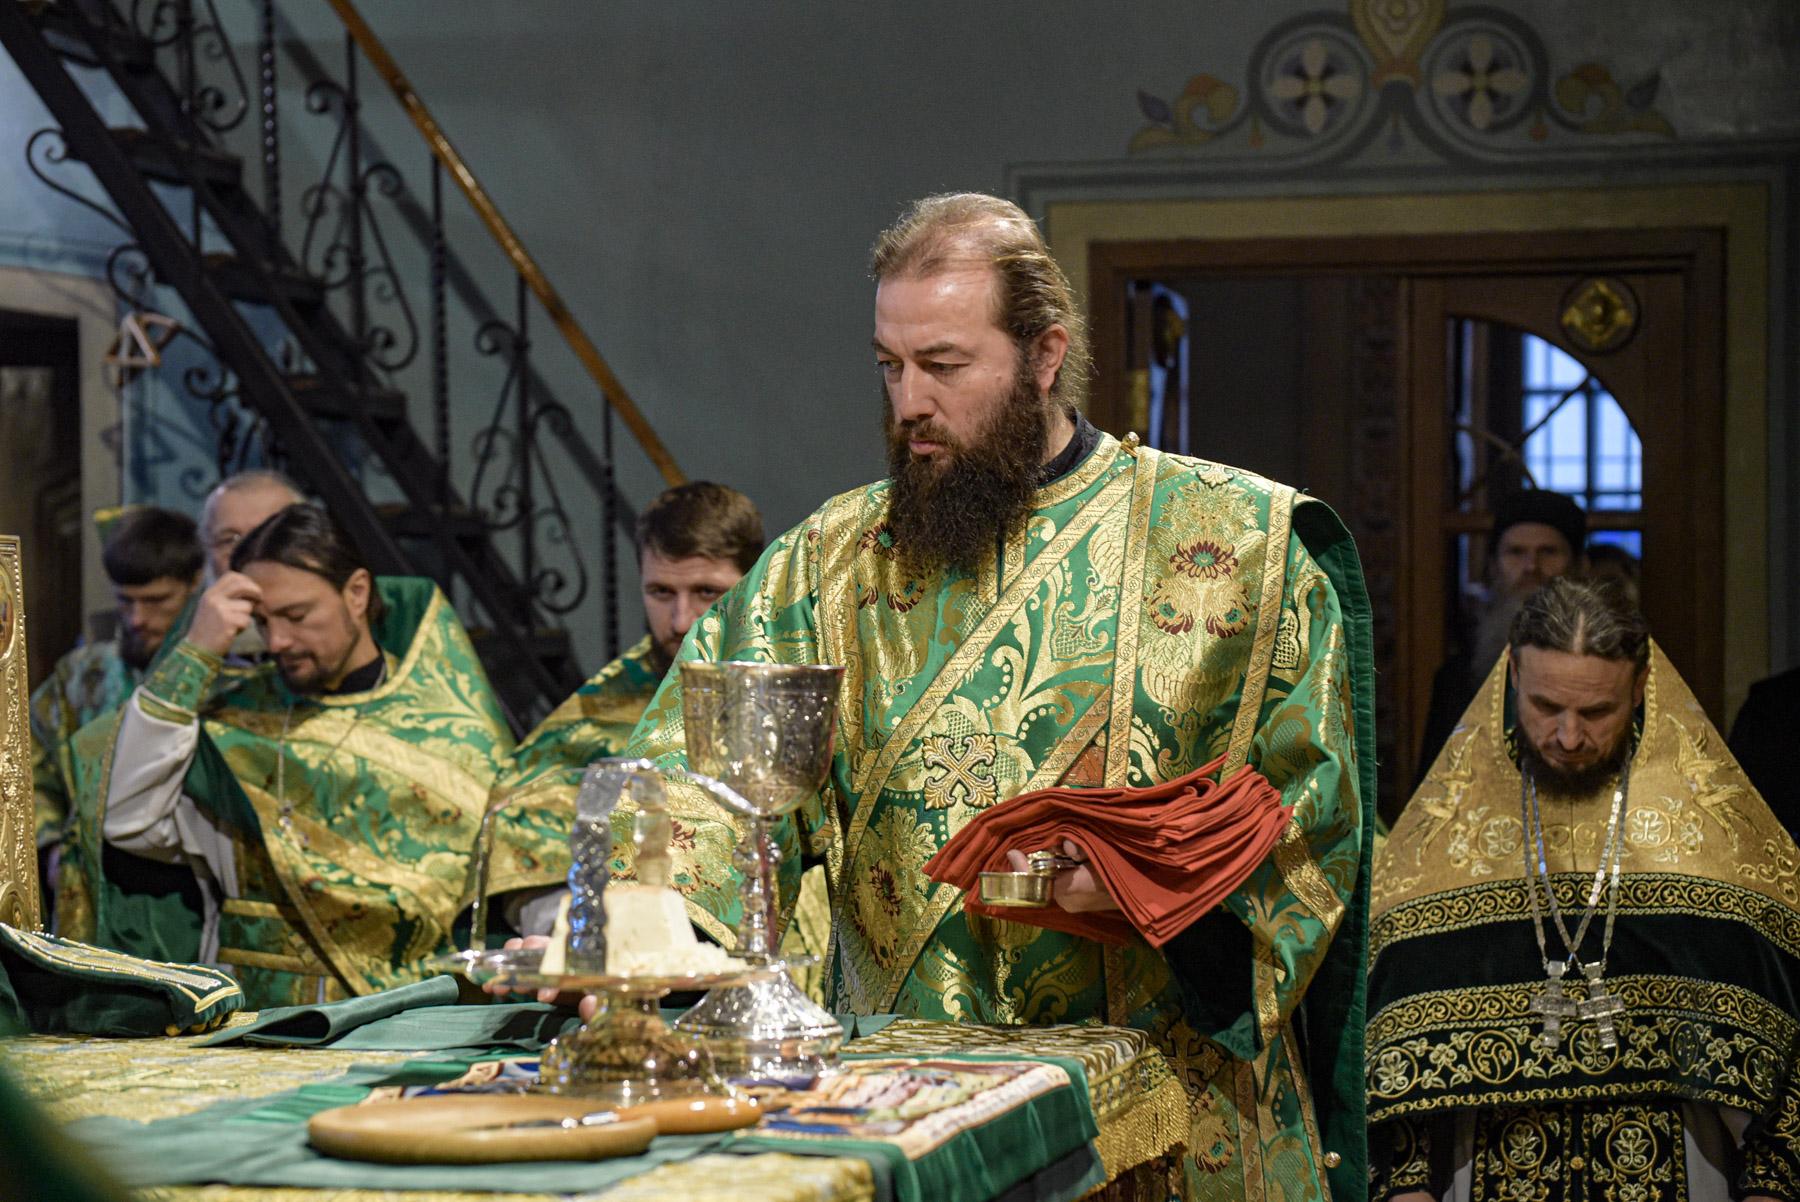 photos of orthodox christmas 0188 2